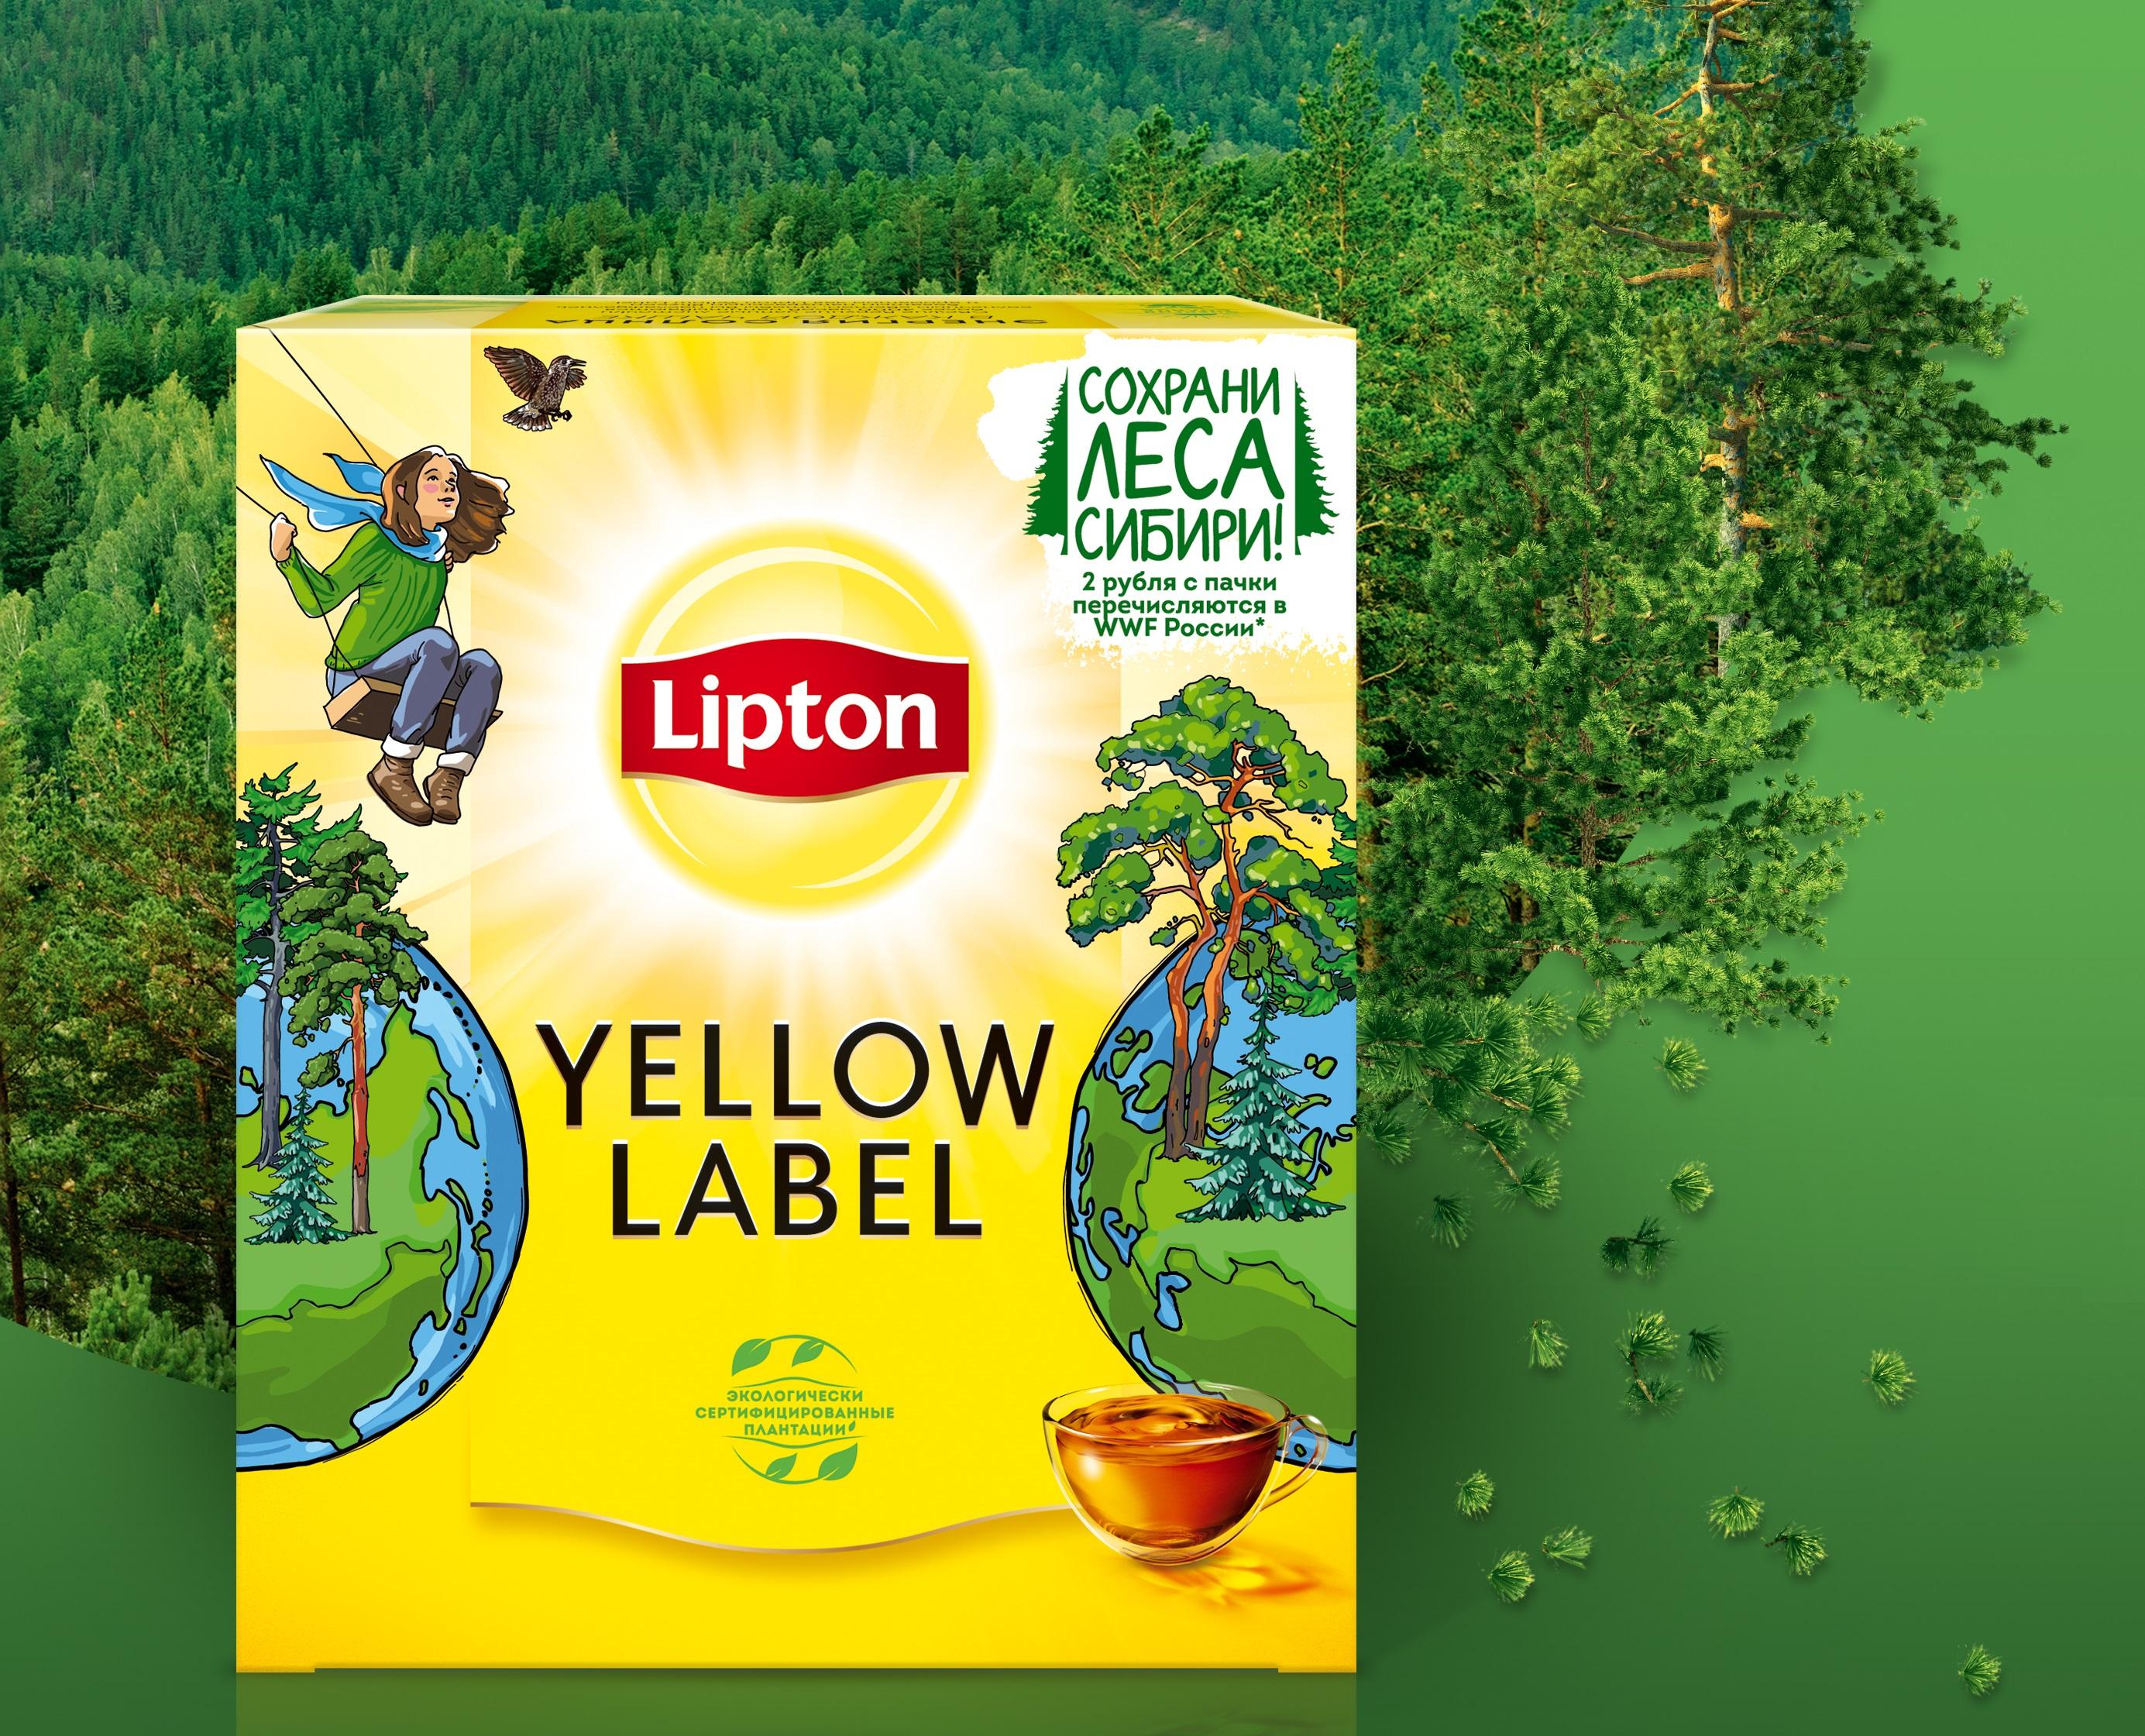 Сохраните леса Сибири вместе с Lipton